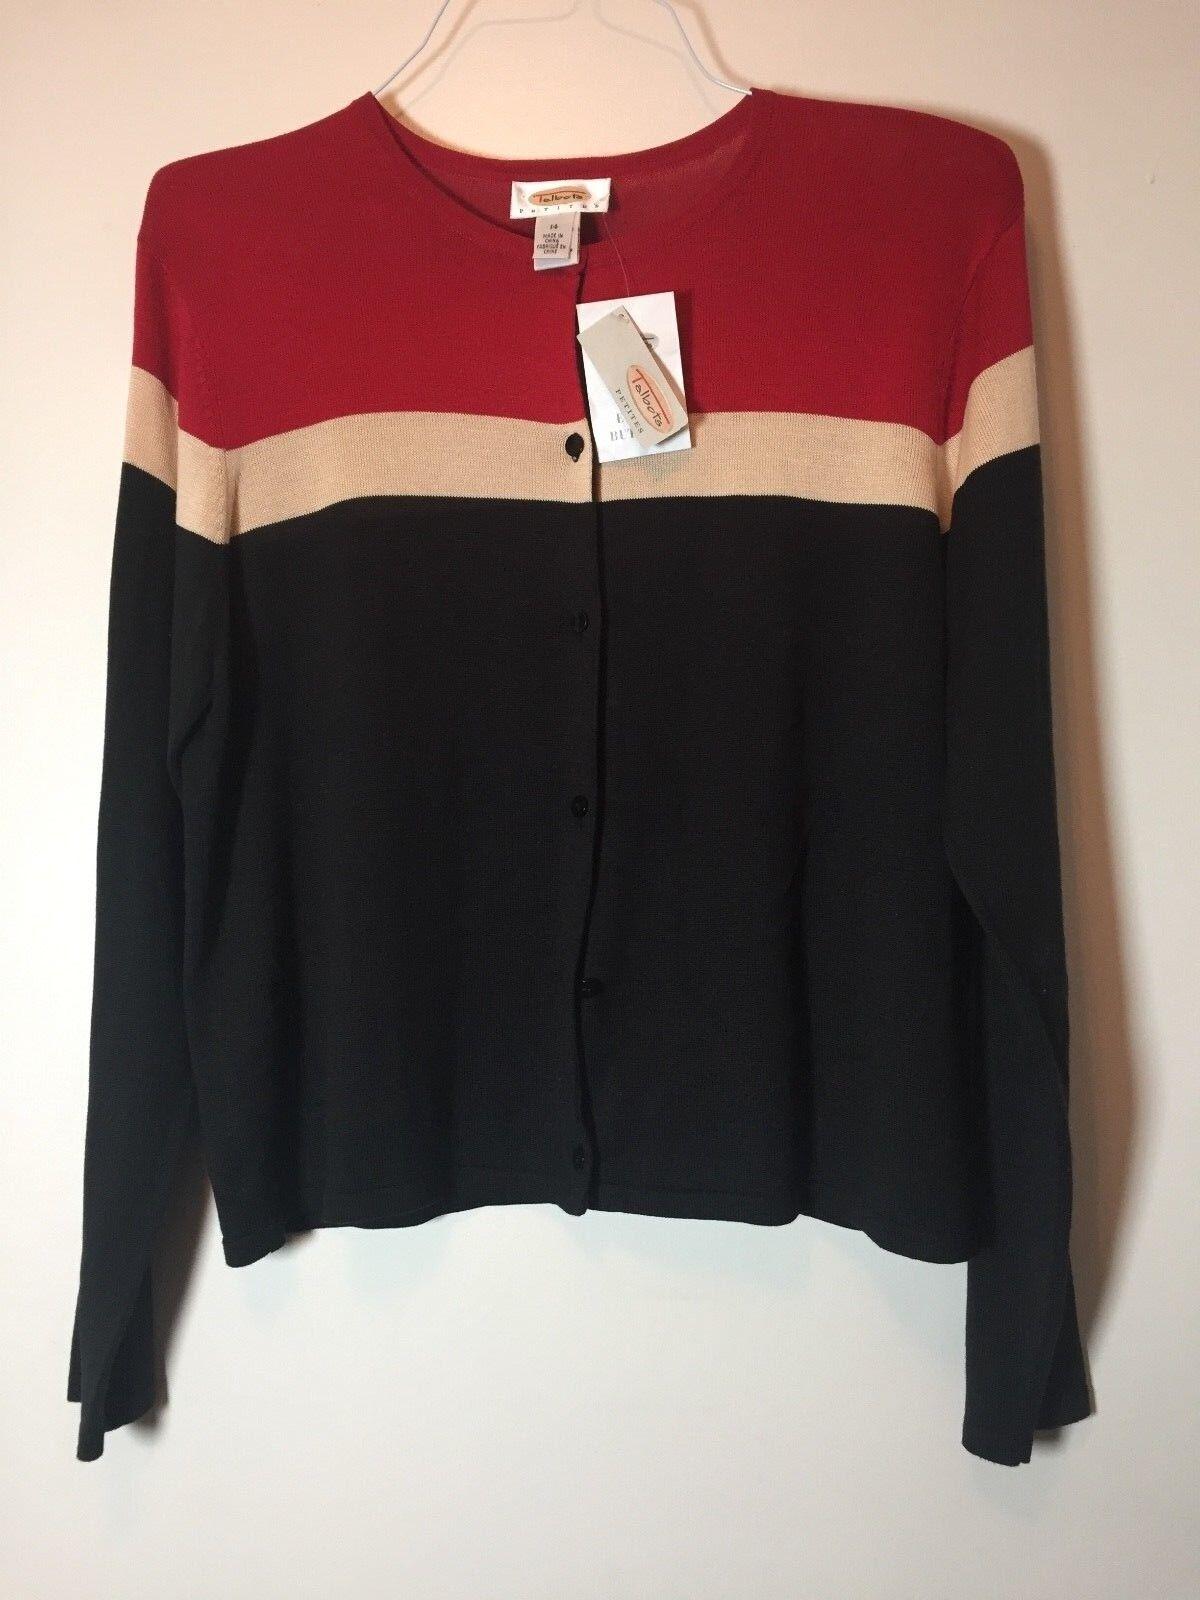 Talbots Petites Women's 100% Silk Cardigan size 14 NEW  178